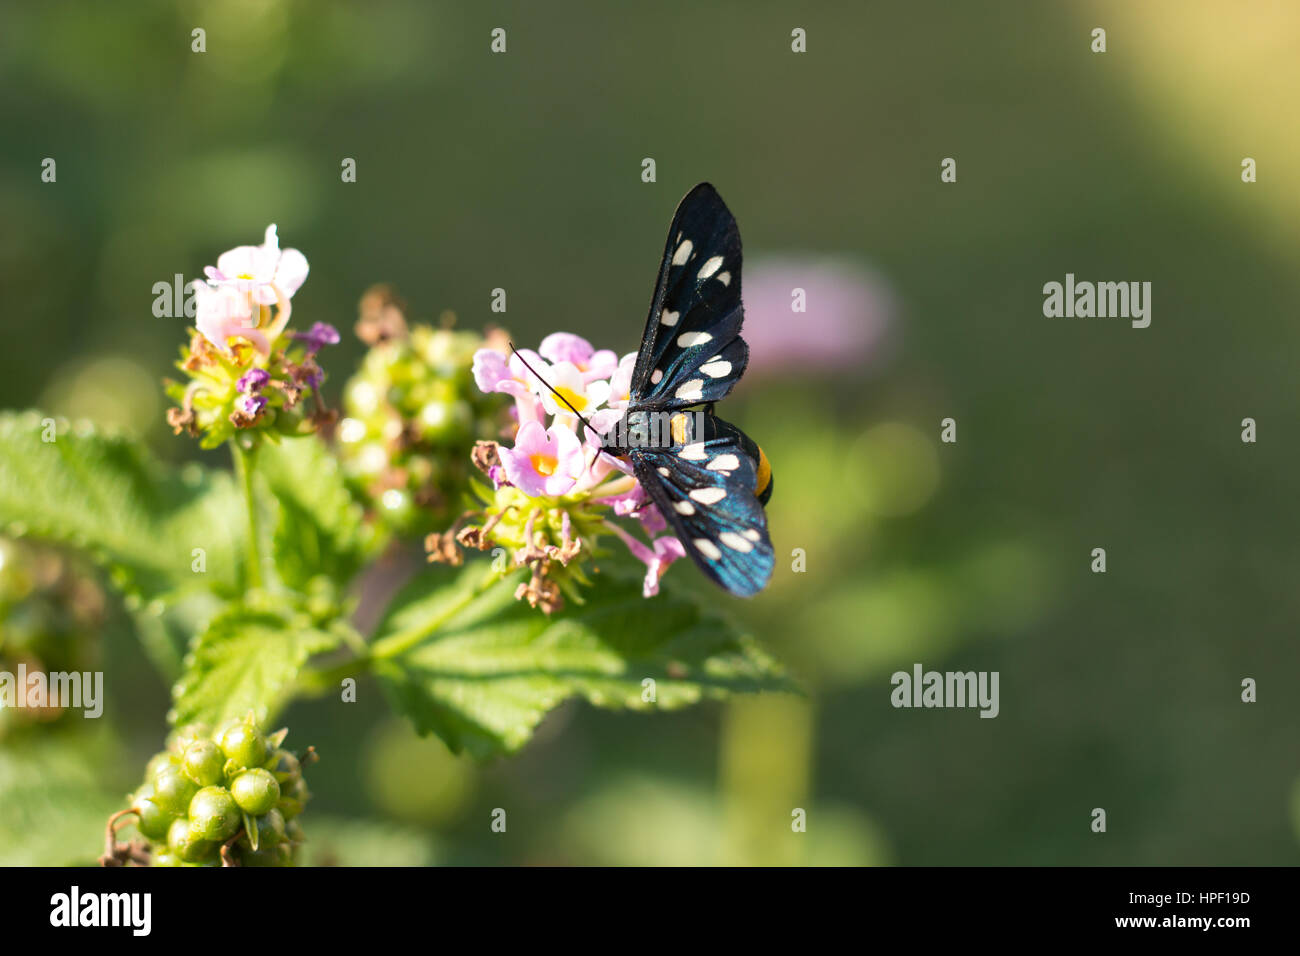 Syntomis Phegea on Flowers - Stock Image